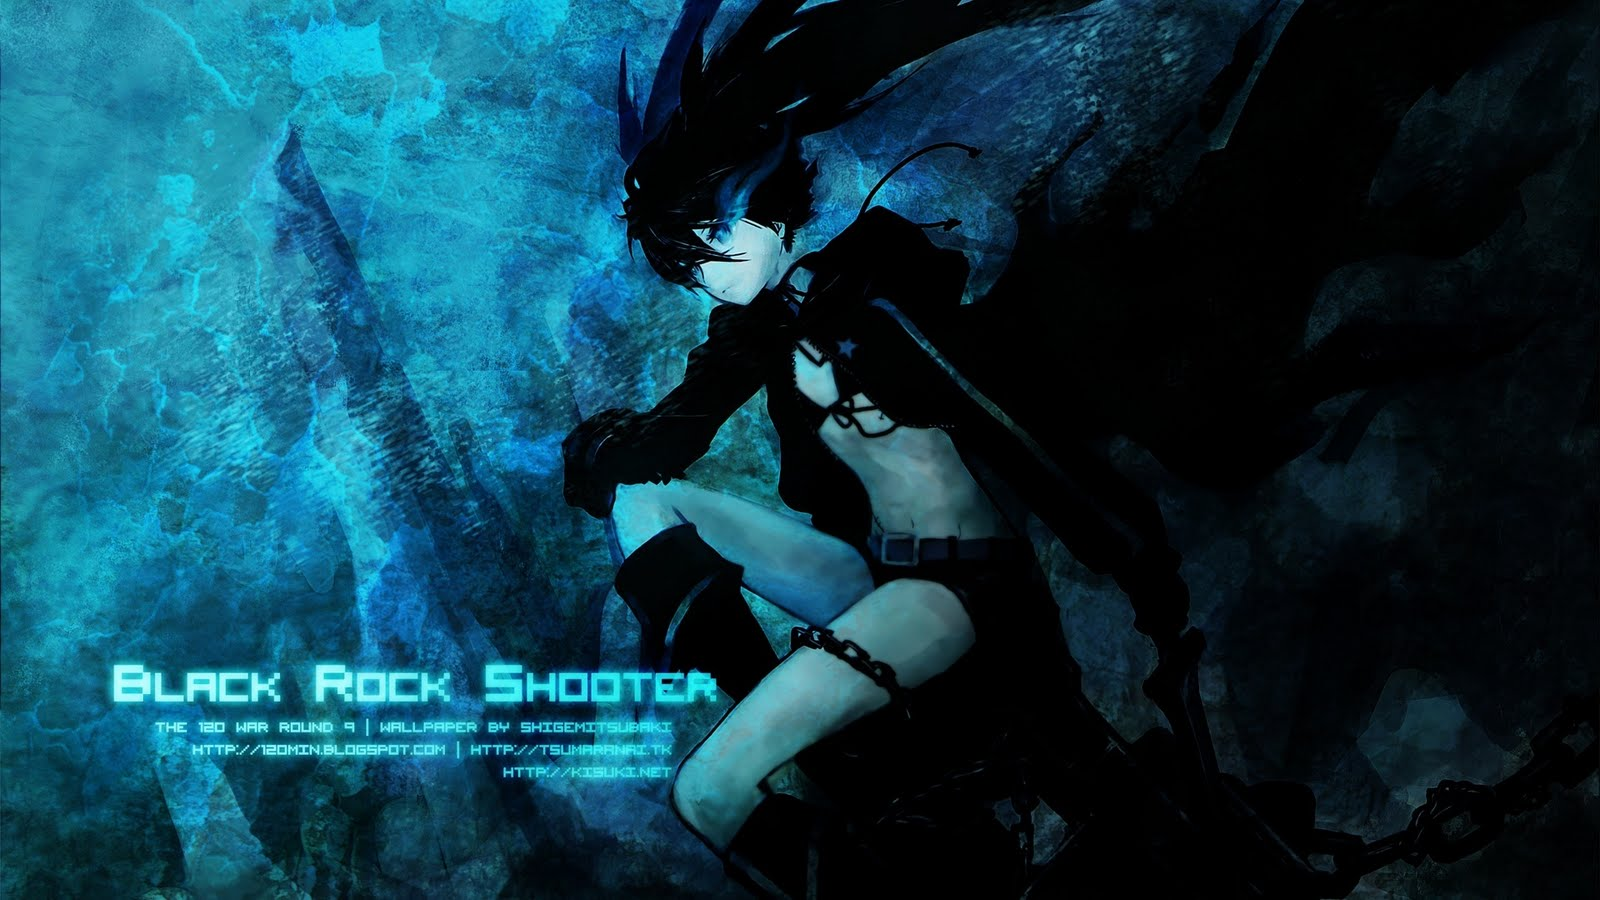 http://3.bp.blogspot.com/-Fcl5Fn_D0FA/TjQTjLaaYEI/AAAAAAAAAvE/f2dQLyzN0NA/s1600/black-rock-shooter-HD.jpg